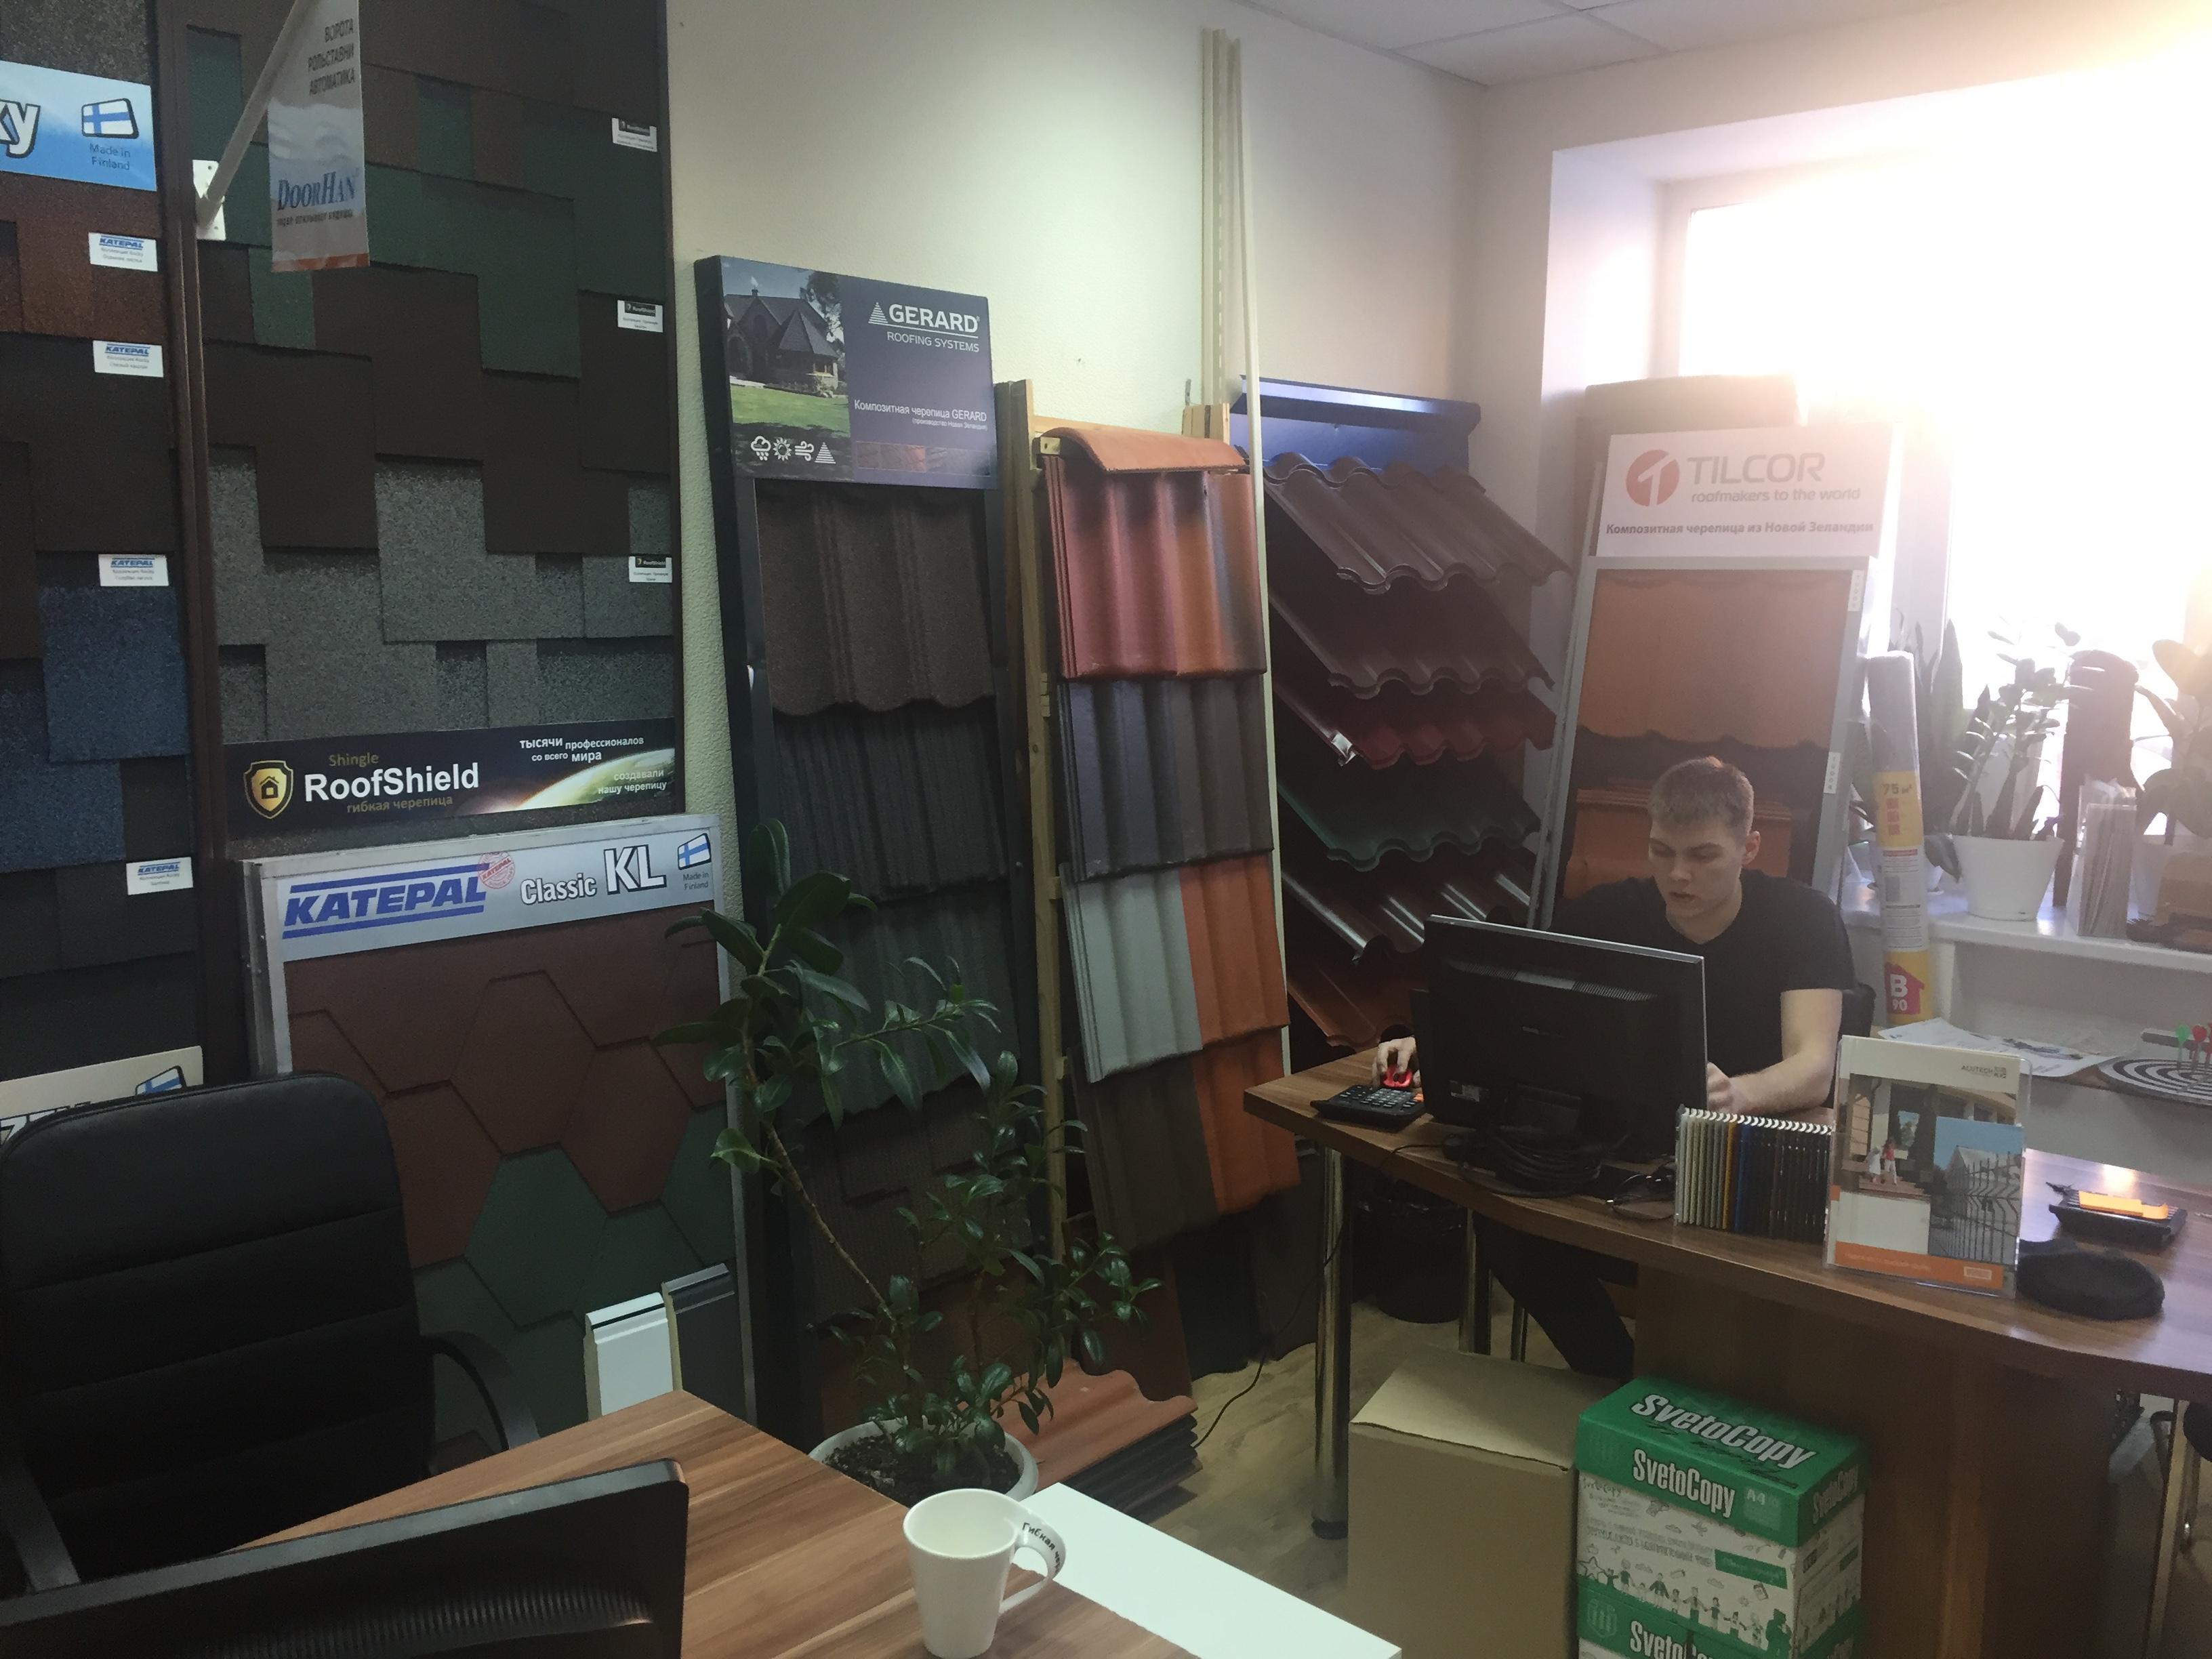 https://krovly-market.ru/images/upload/IMG_9049-12-01-18-09-36.JPG